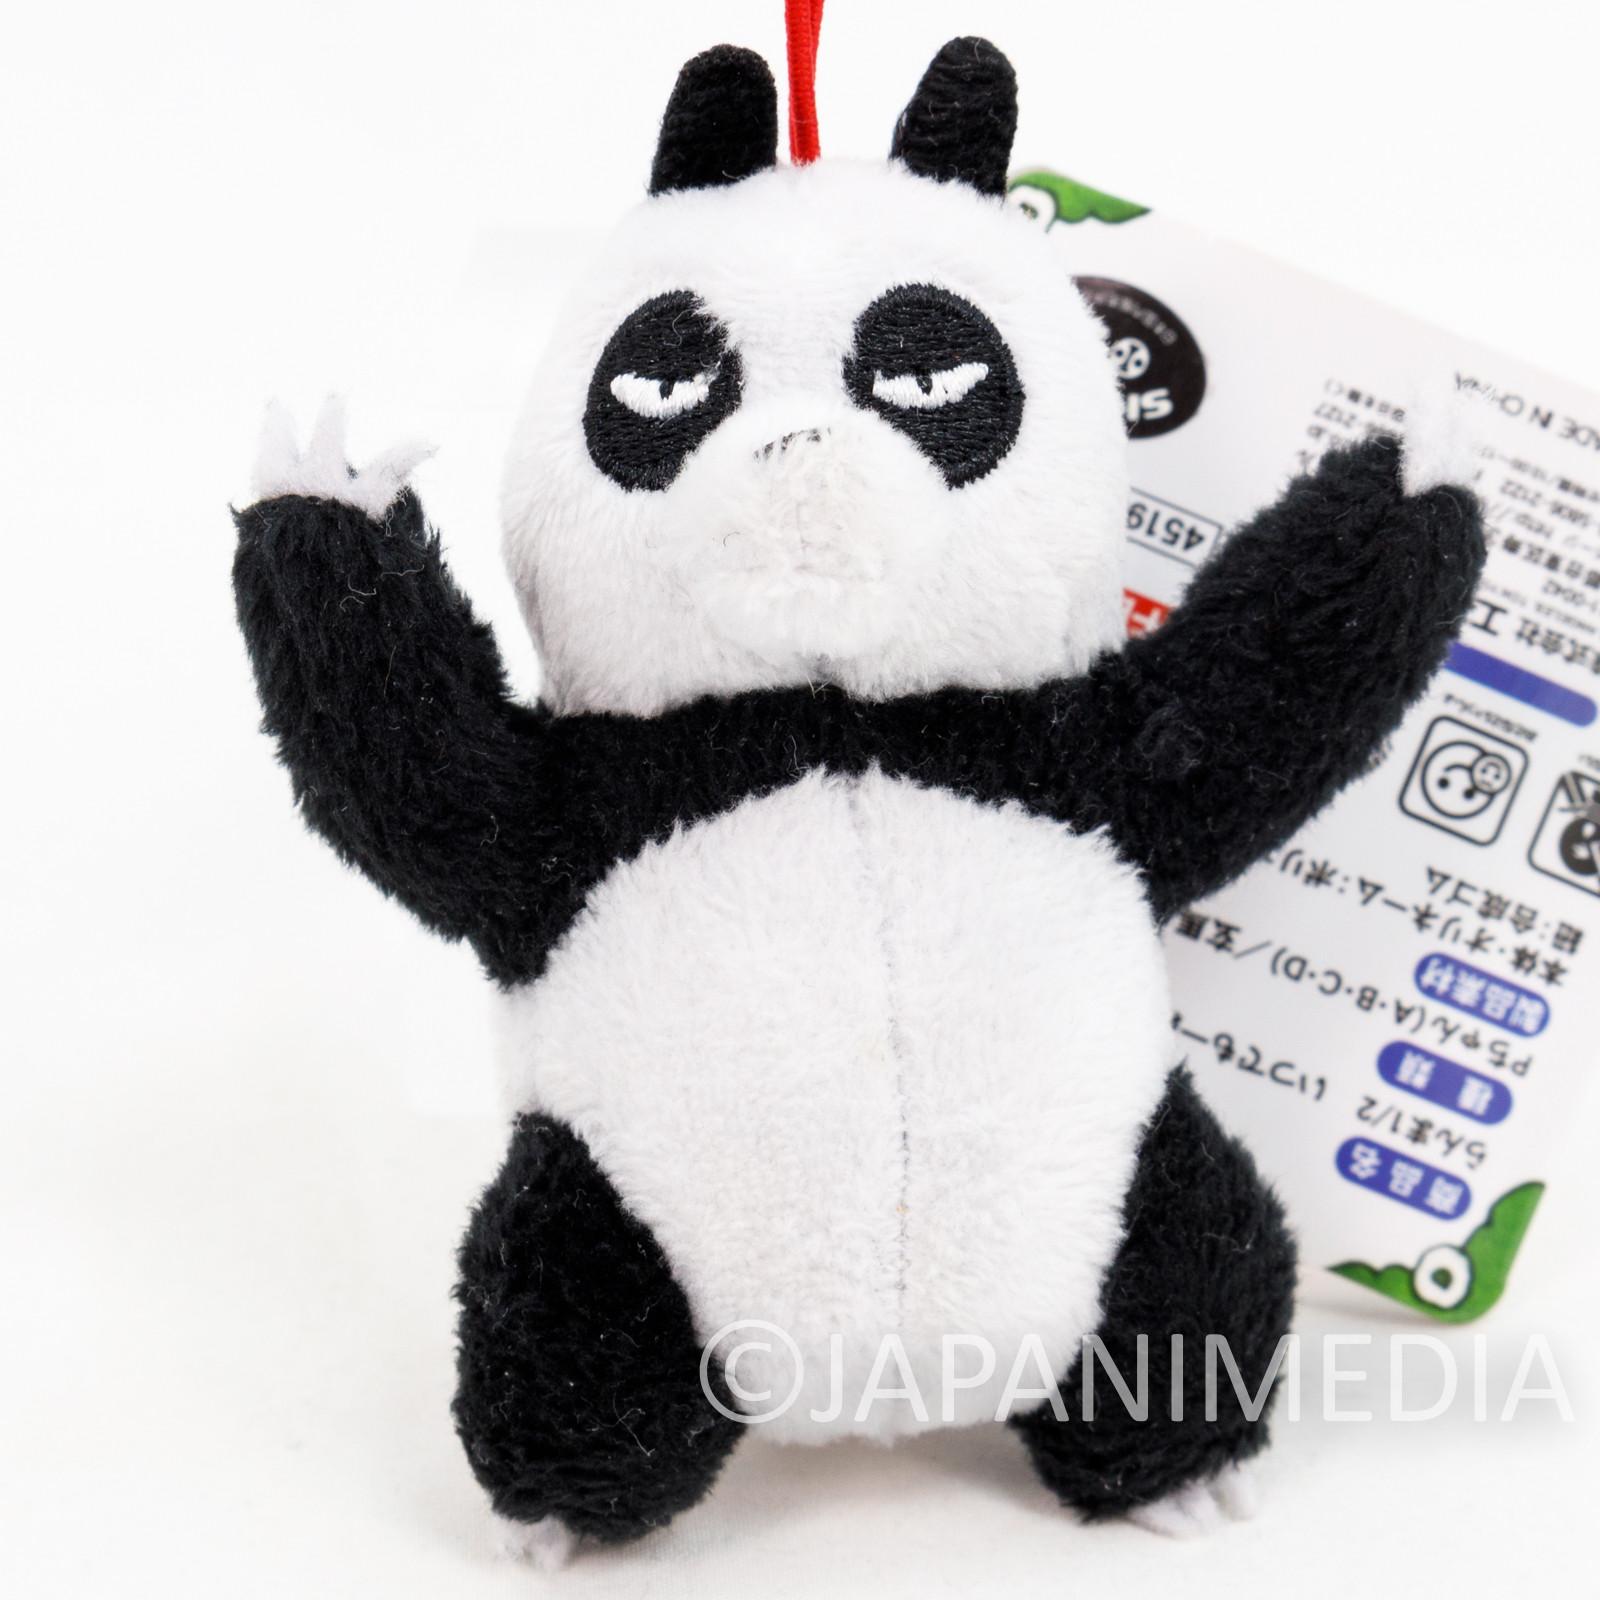 "Ranma 1/2 Genma Saotome Panda Father 3.5"" Plush Doll SK JAPAN ANIME MANGA"